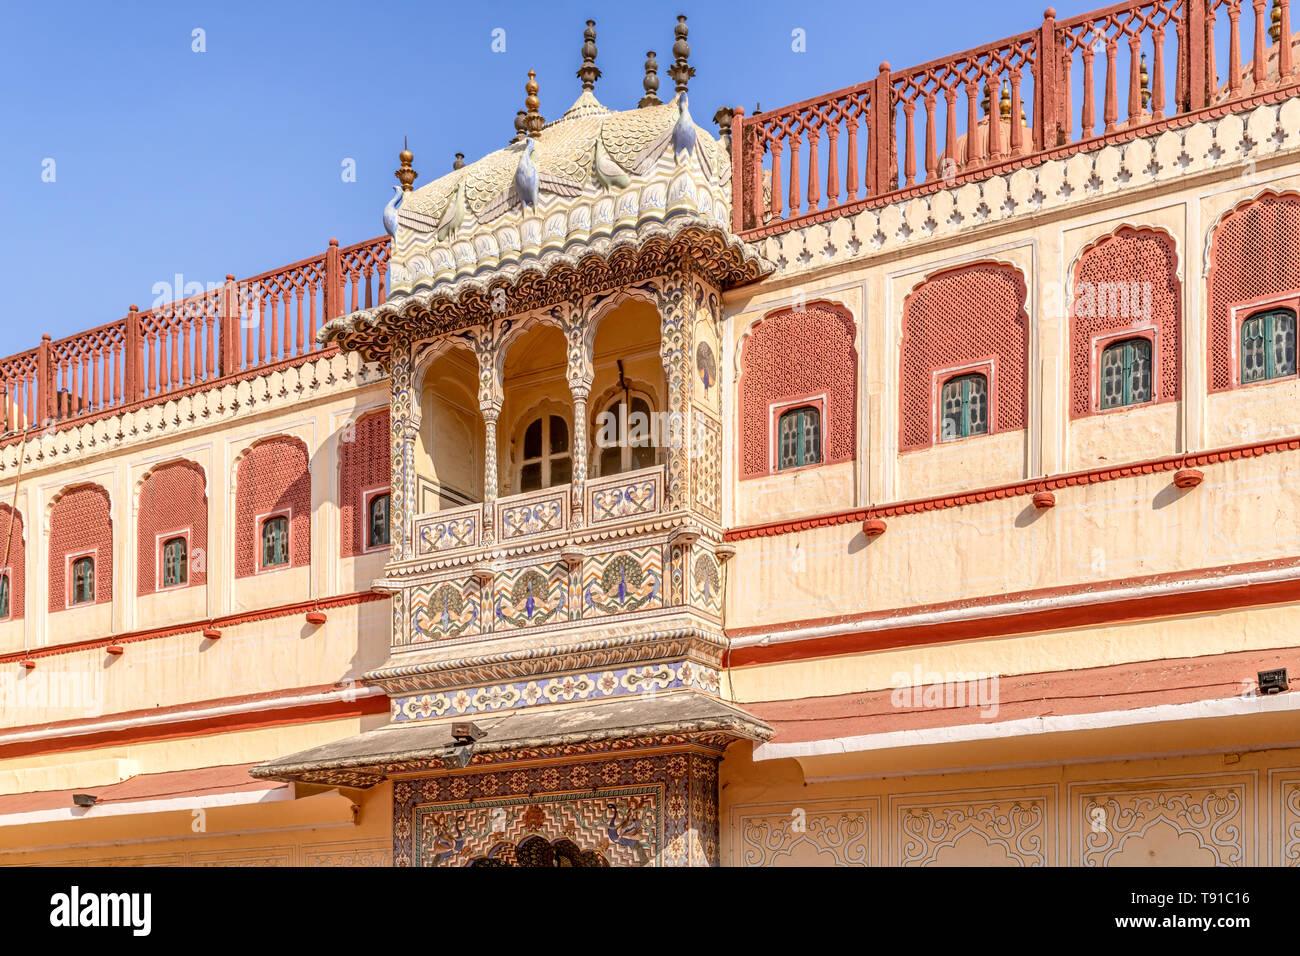 Facade o the Chandra Mahal, the residence of royal family in Jaipur City Palace, Jaipur, Rajasthan, India - Stock Image